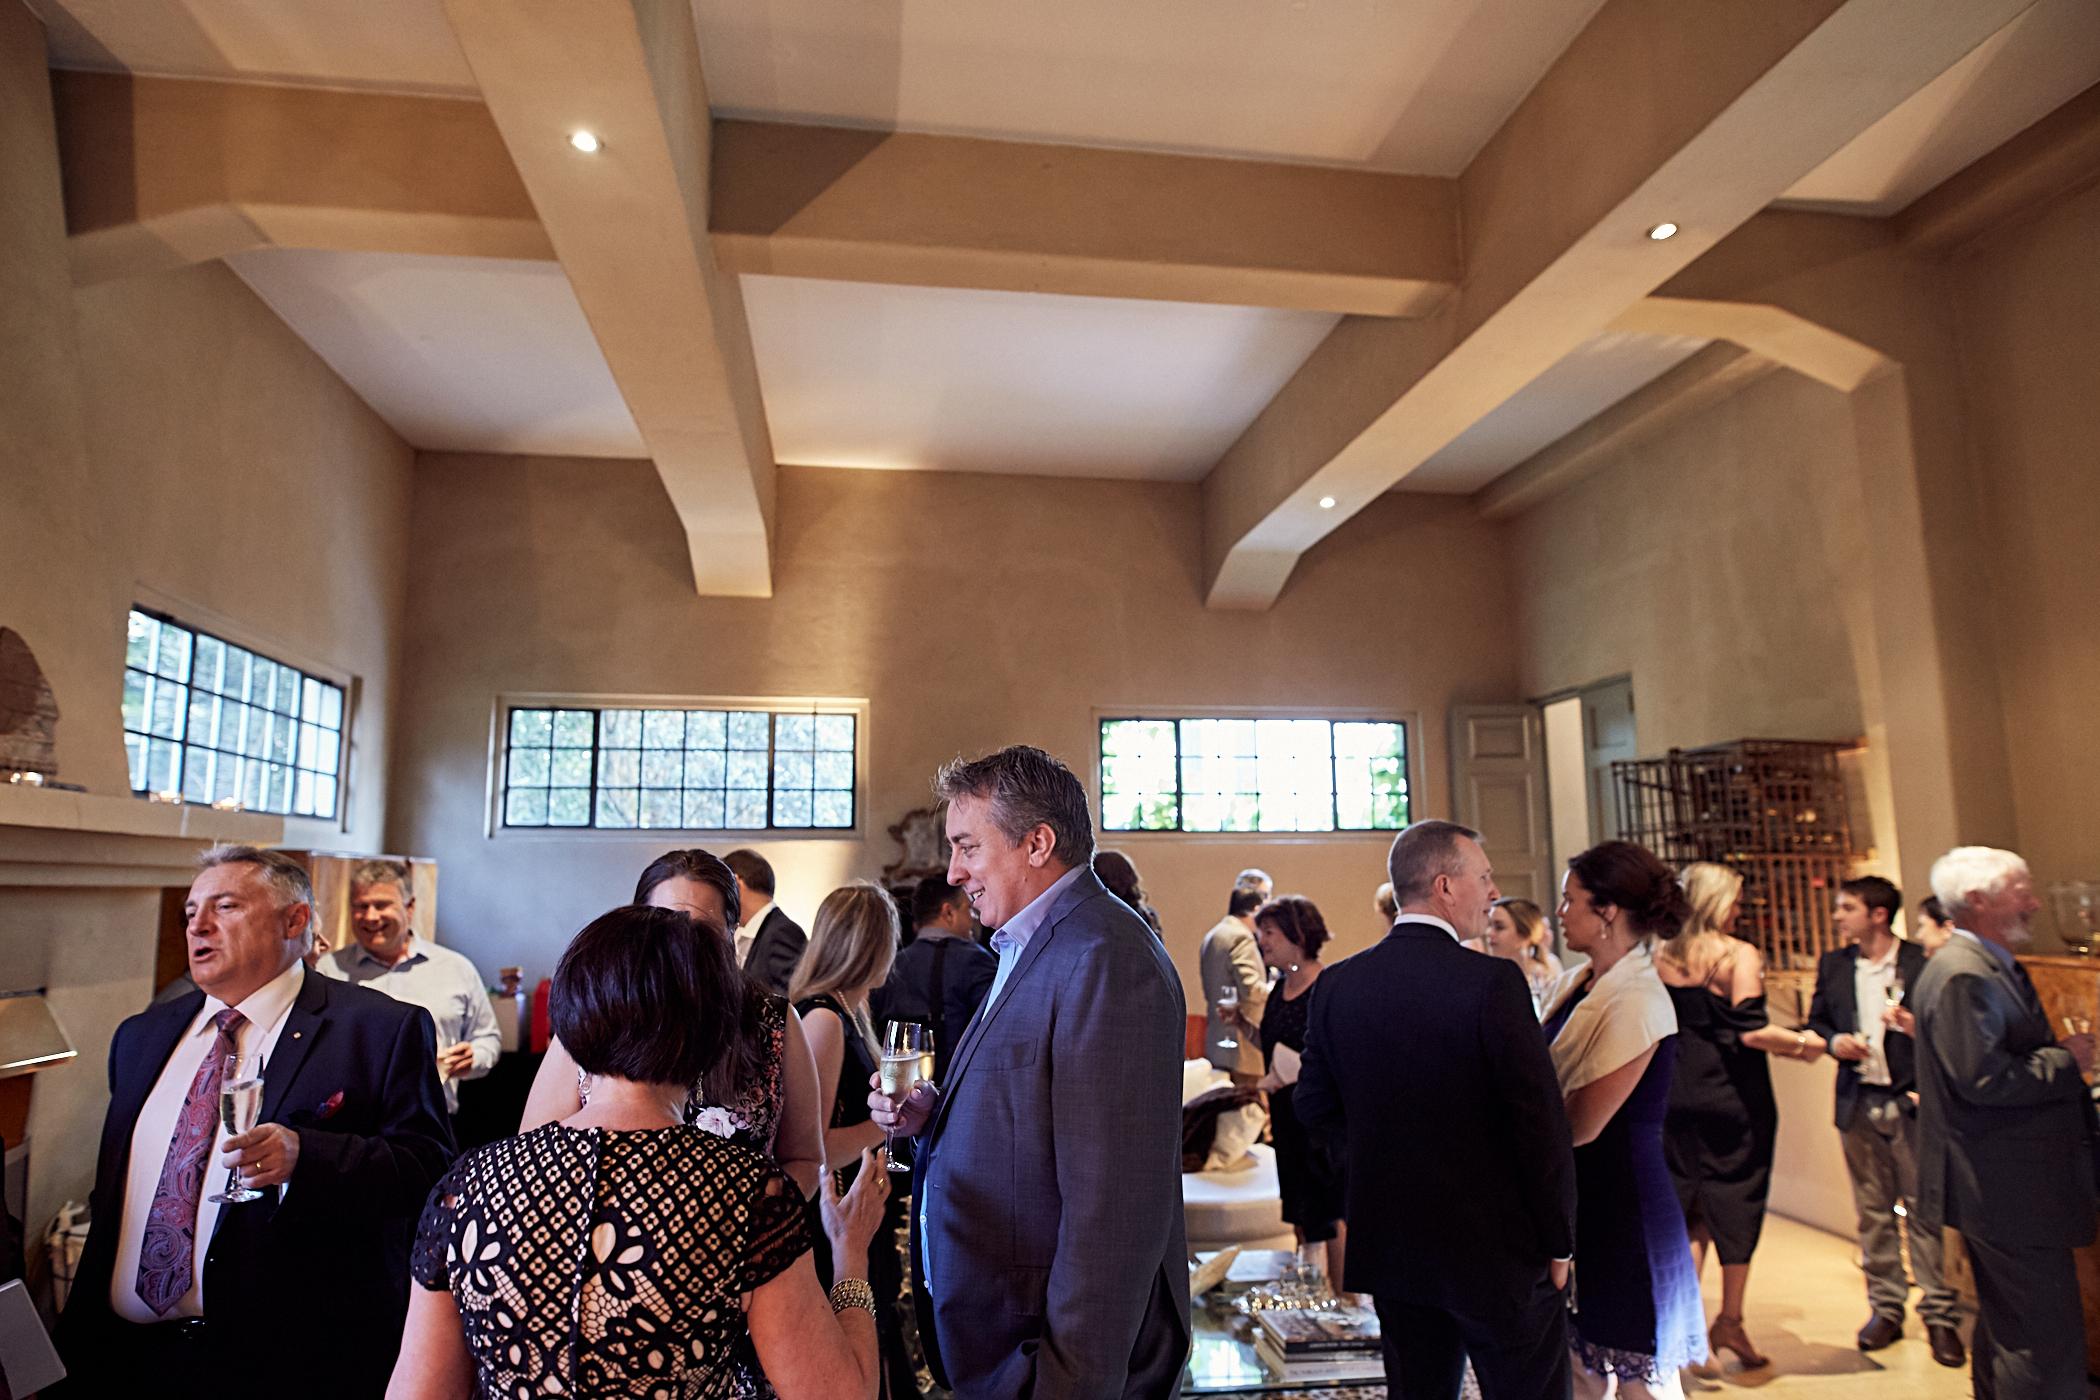 Inside Mantells wedding venue